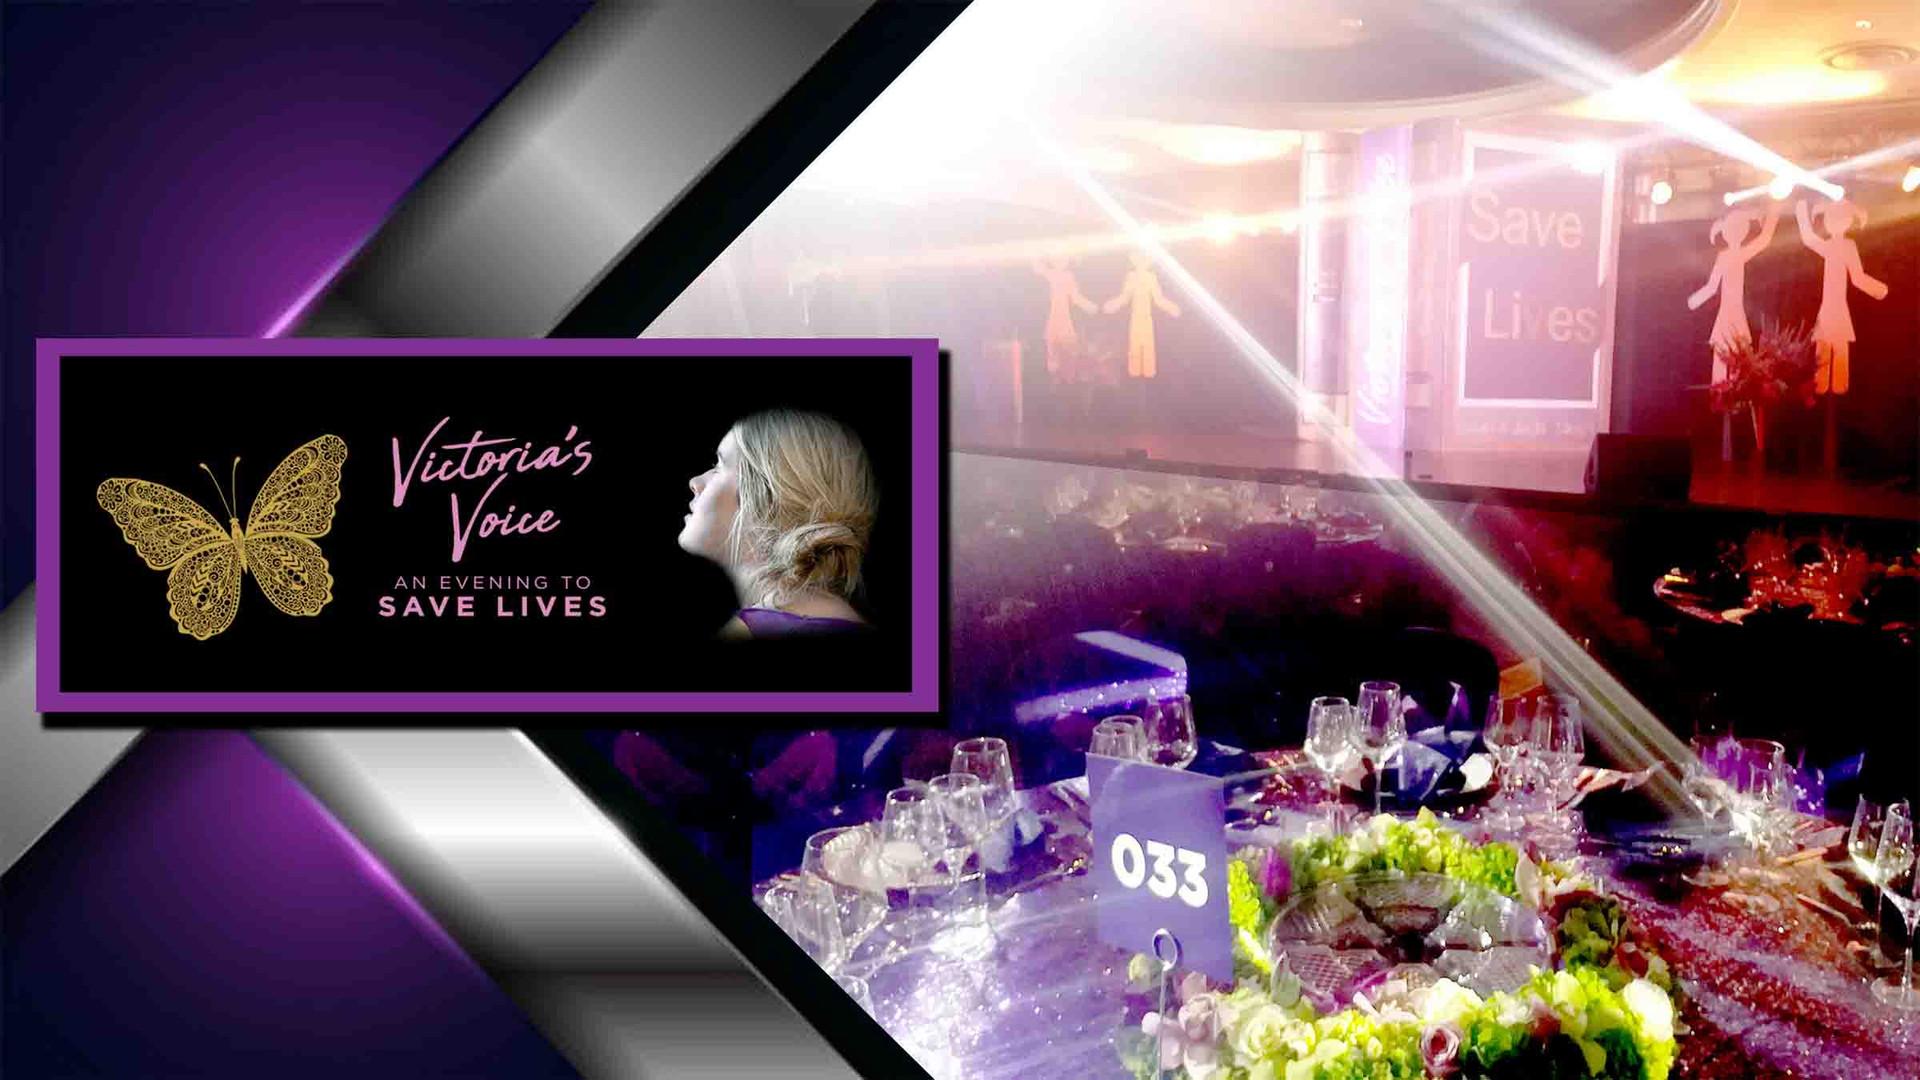 Victori's Voice Gala Load in 03_50%.jpg